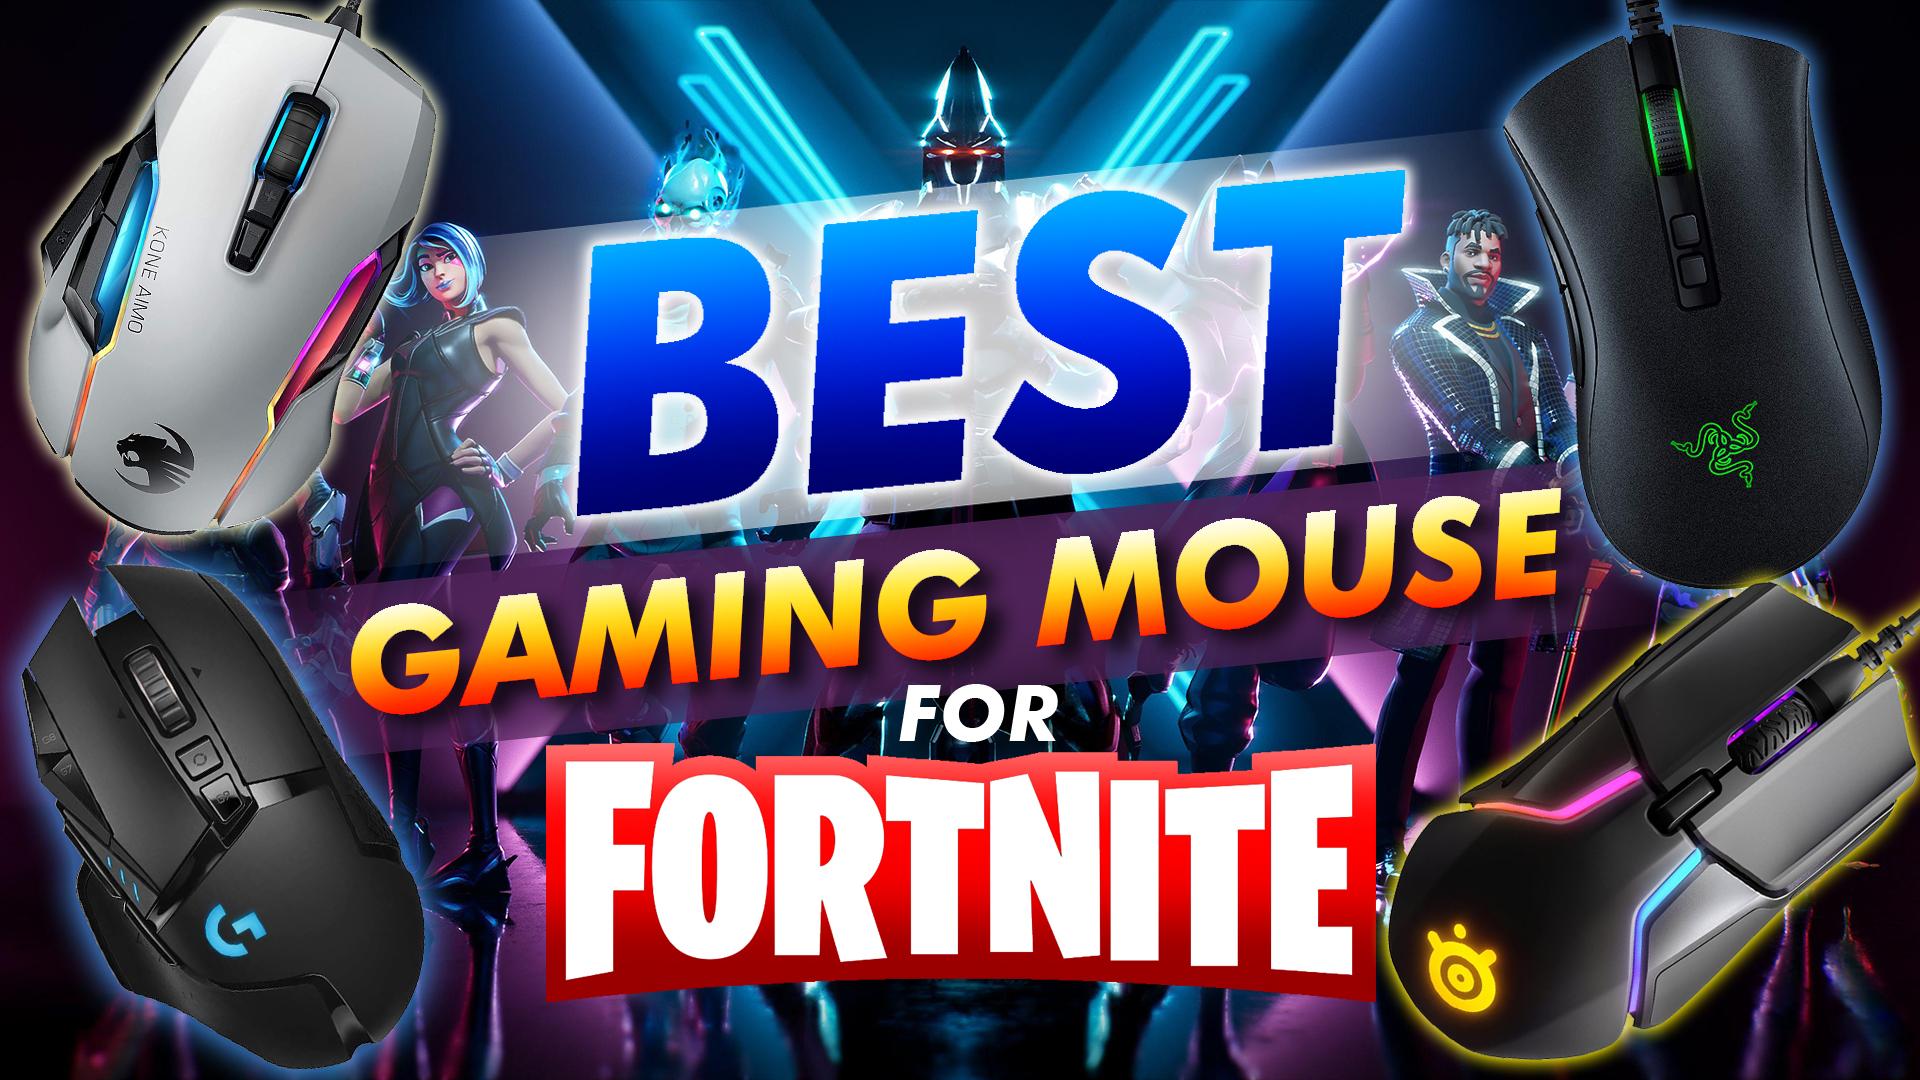 Fortnite Ps4 No Cursor Best Gaming Mouse For Fortnite Players Updated June 2021 Hayk Saakian